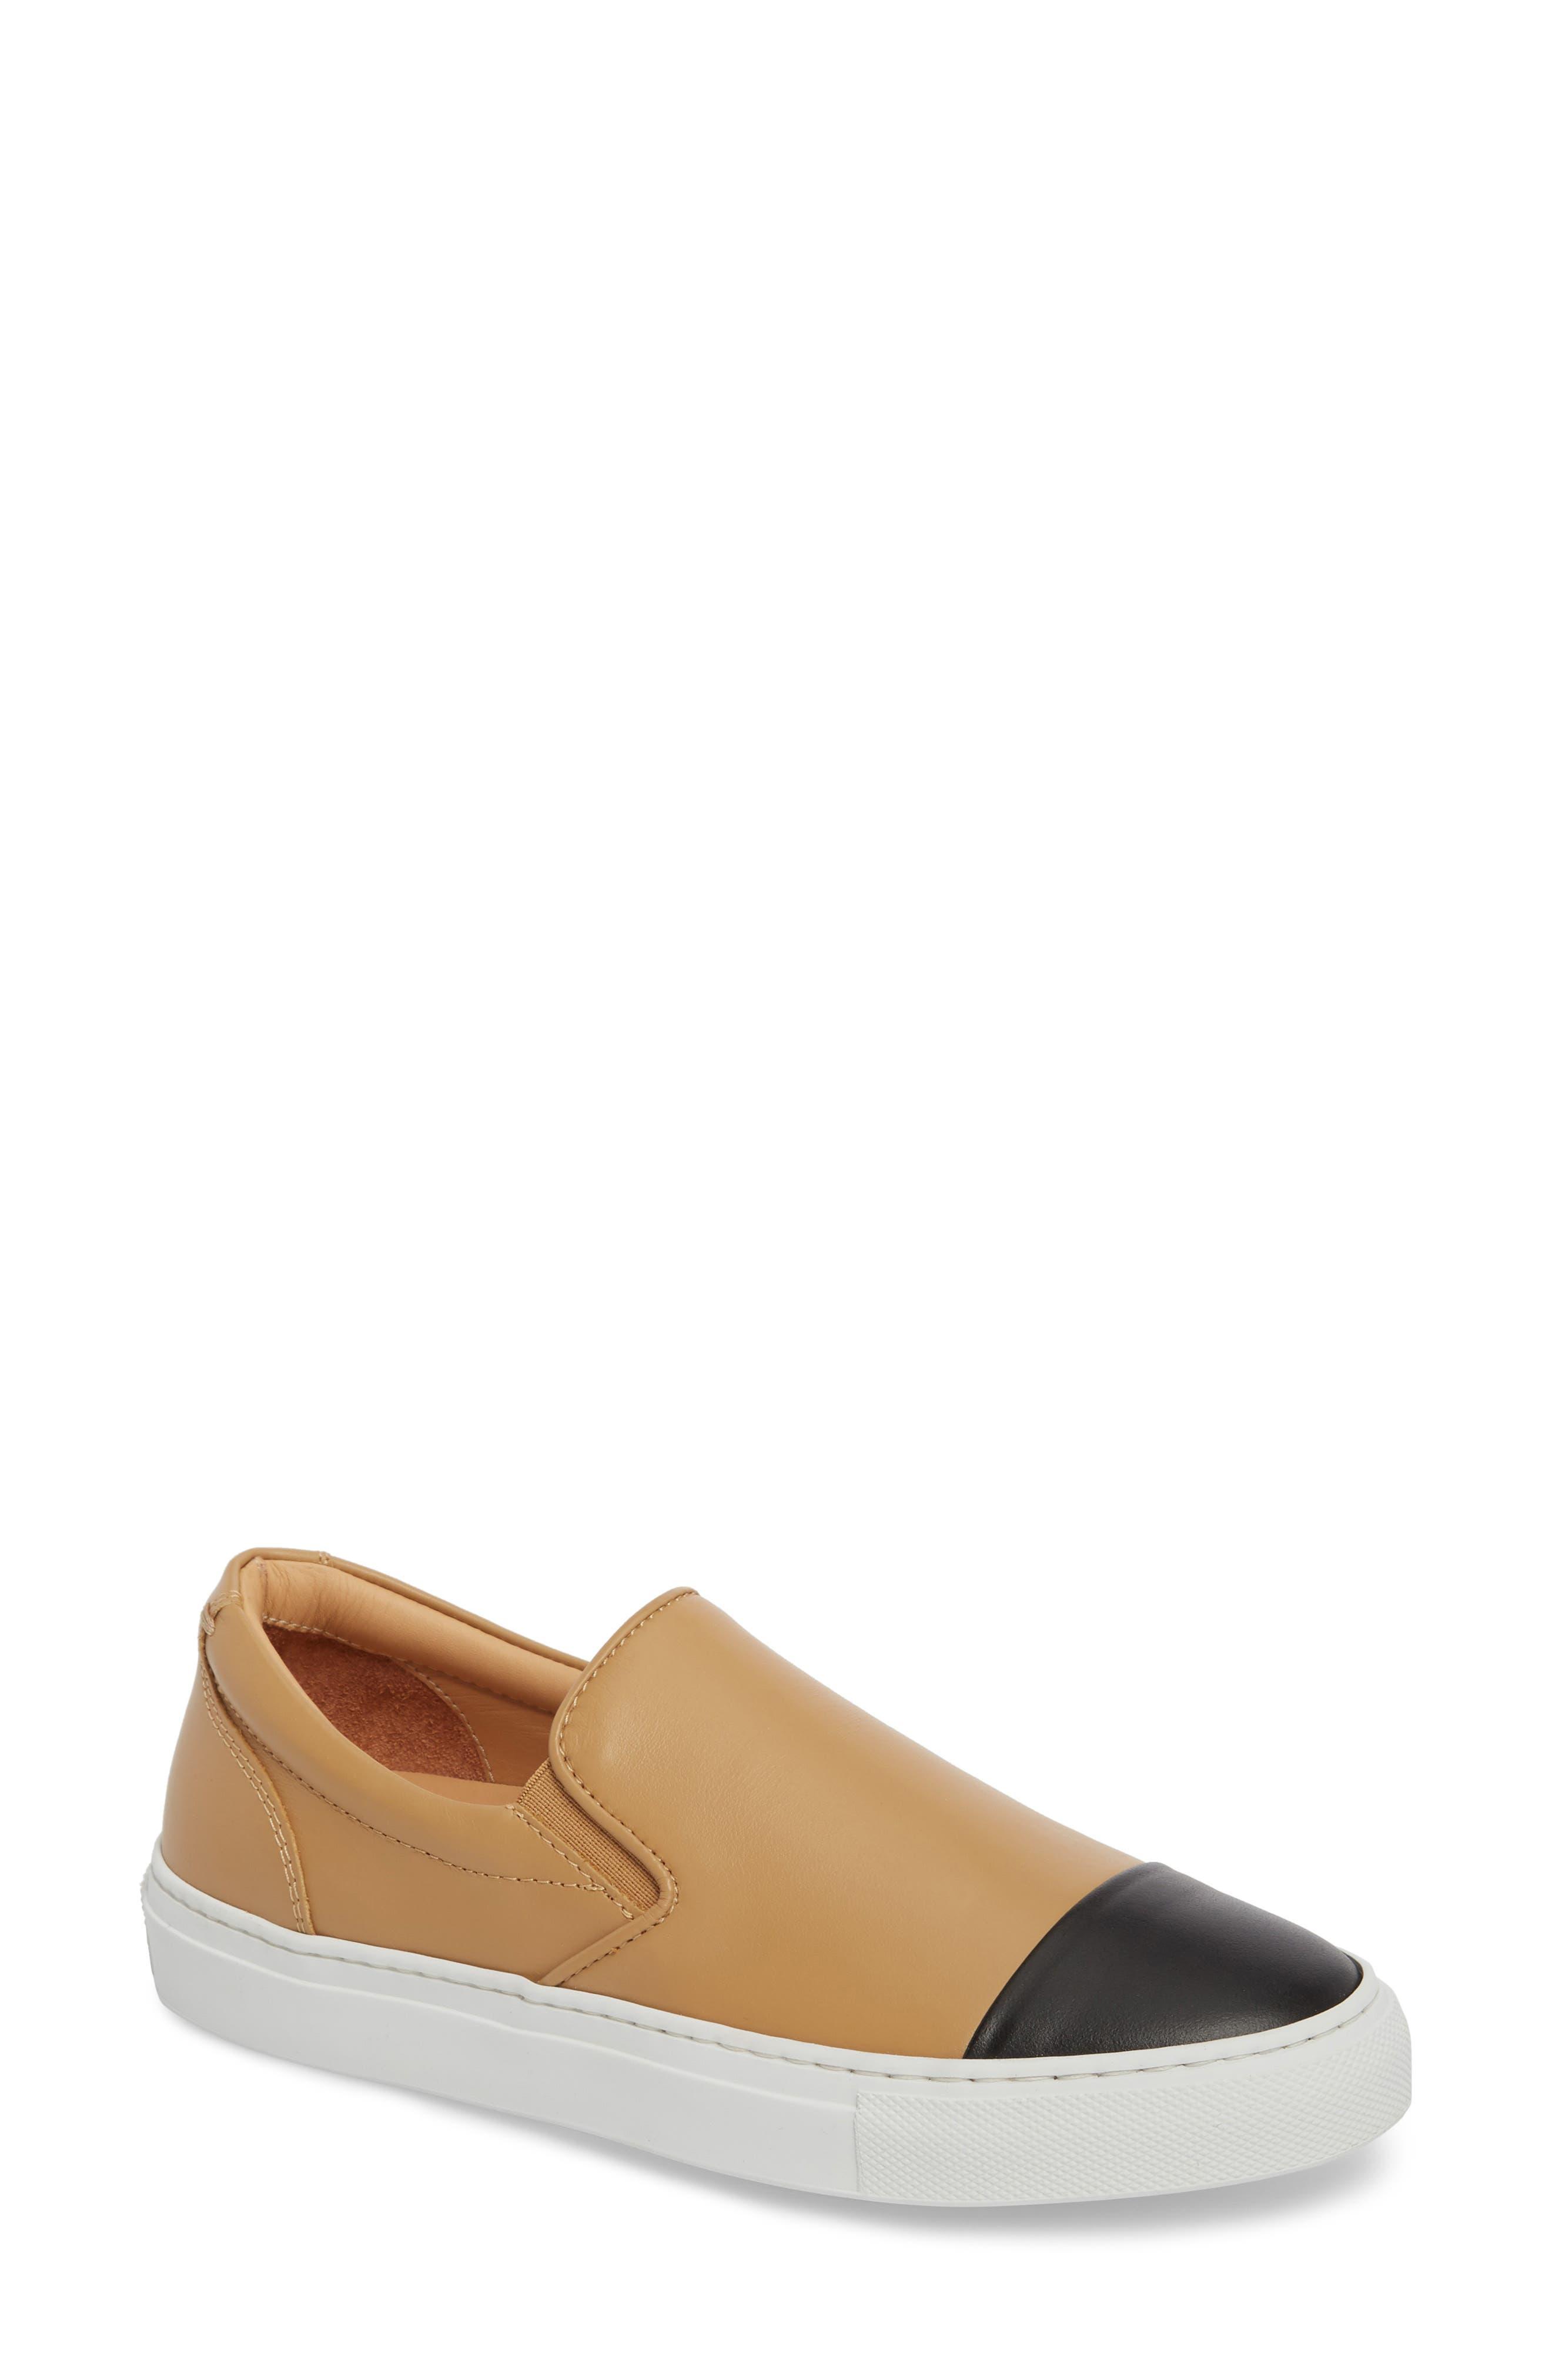 Wooster Cap Toe Slip-On Sneaker,                         Main,                         color, ALMOND